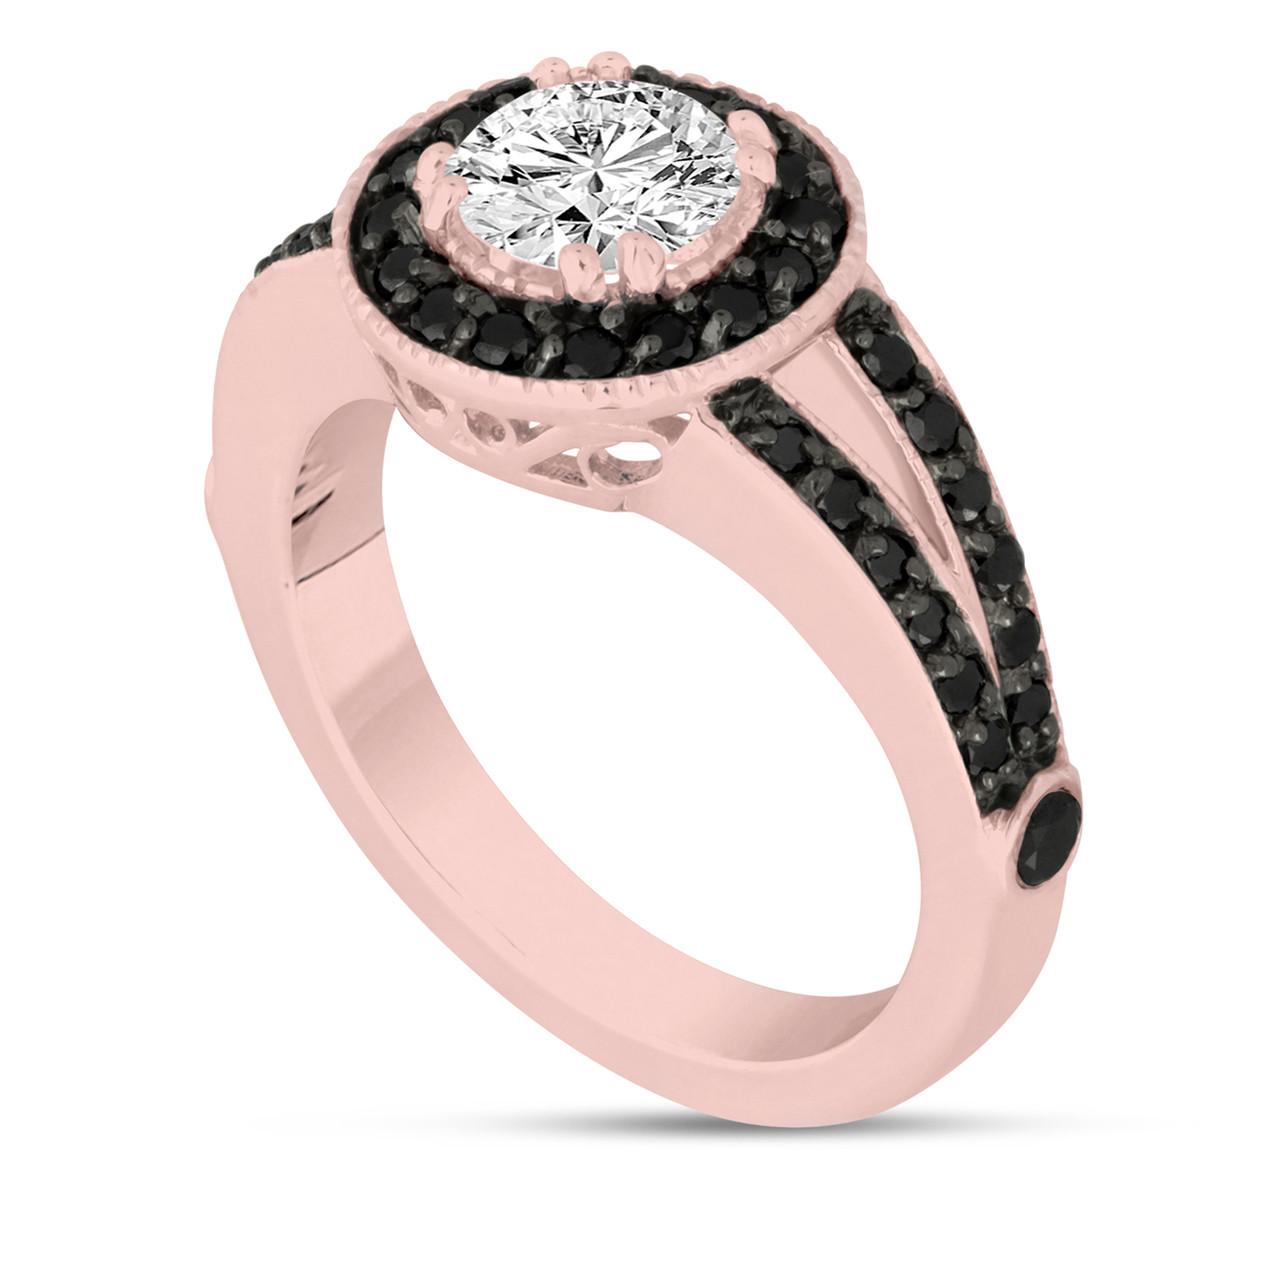 White and Fancy Black Diamonds Engagement Ring 1.56 Carat 14K Rose ...